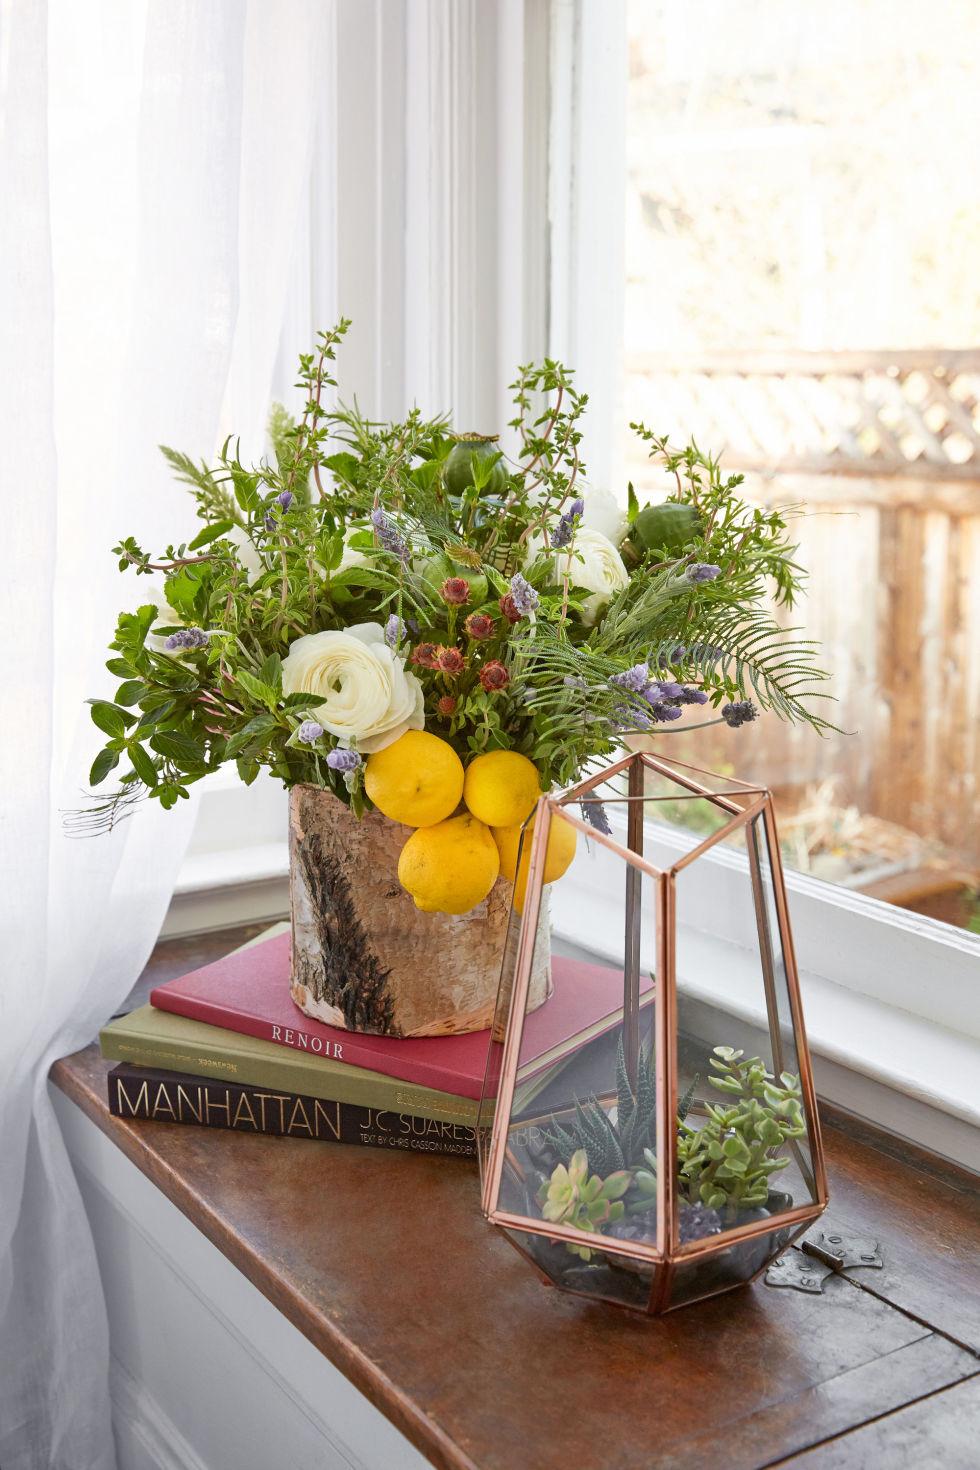 55 easy flower arrangement decoration ideas & pictures - how to